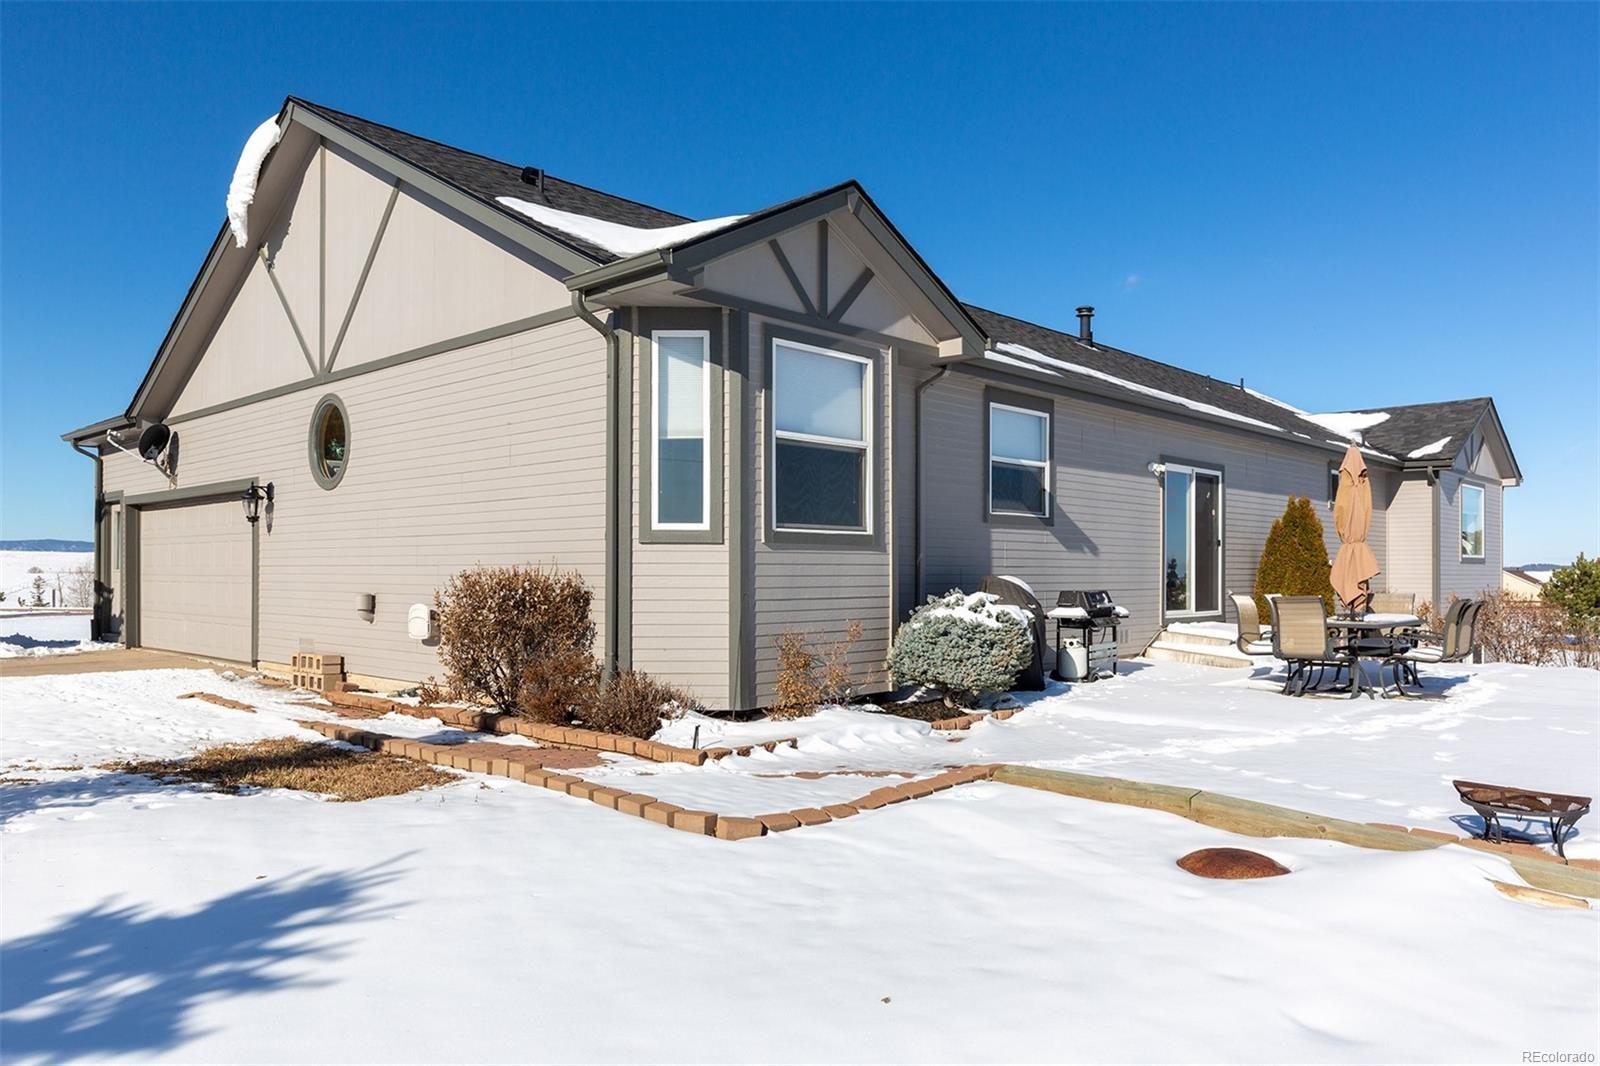 MLS# 4807349 - 3 - 15325 Terra Ridge Circle, Colorado Springs, CO 80908